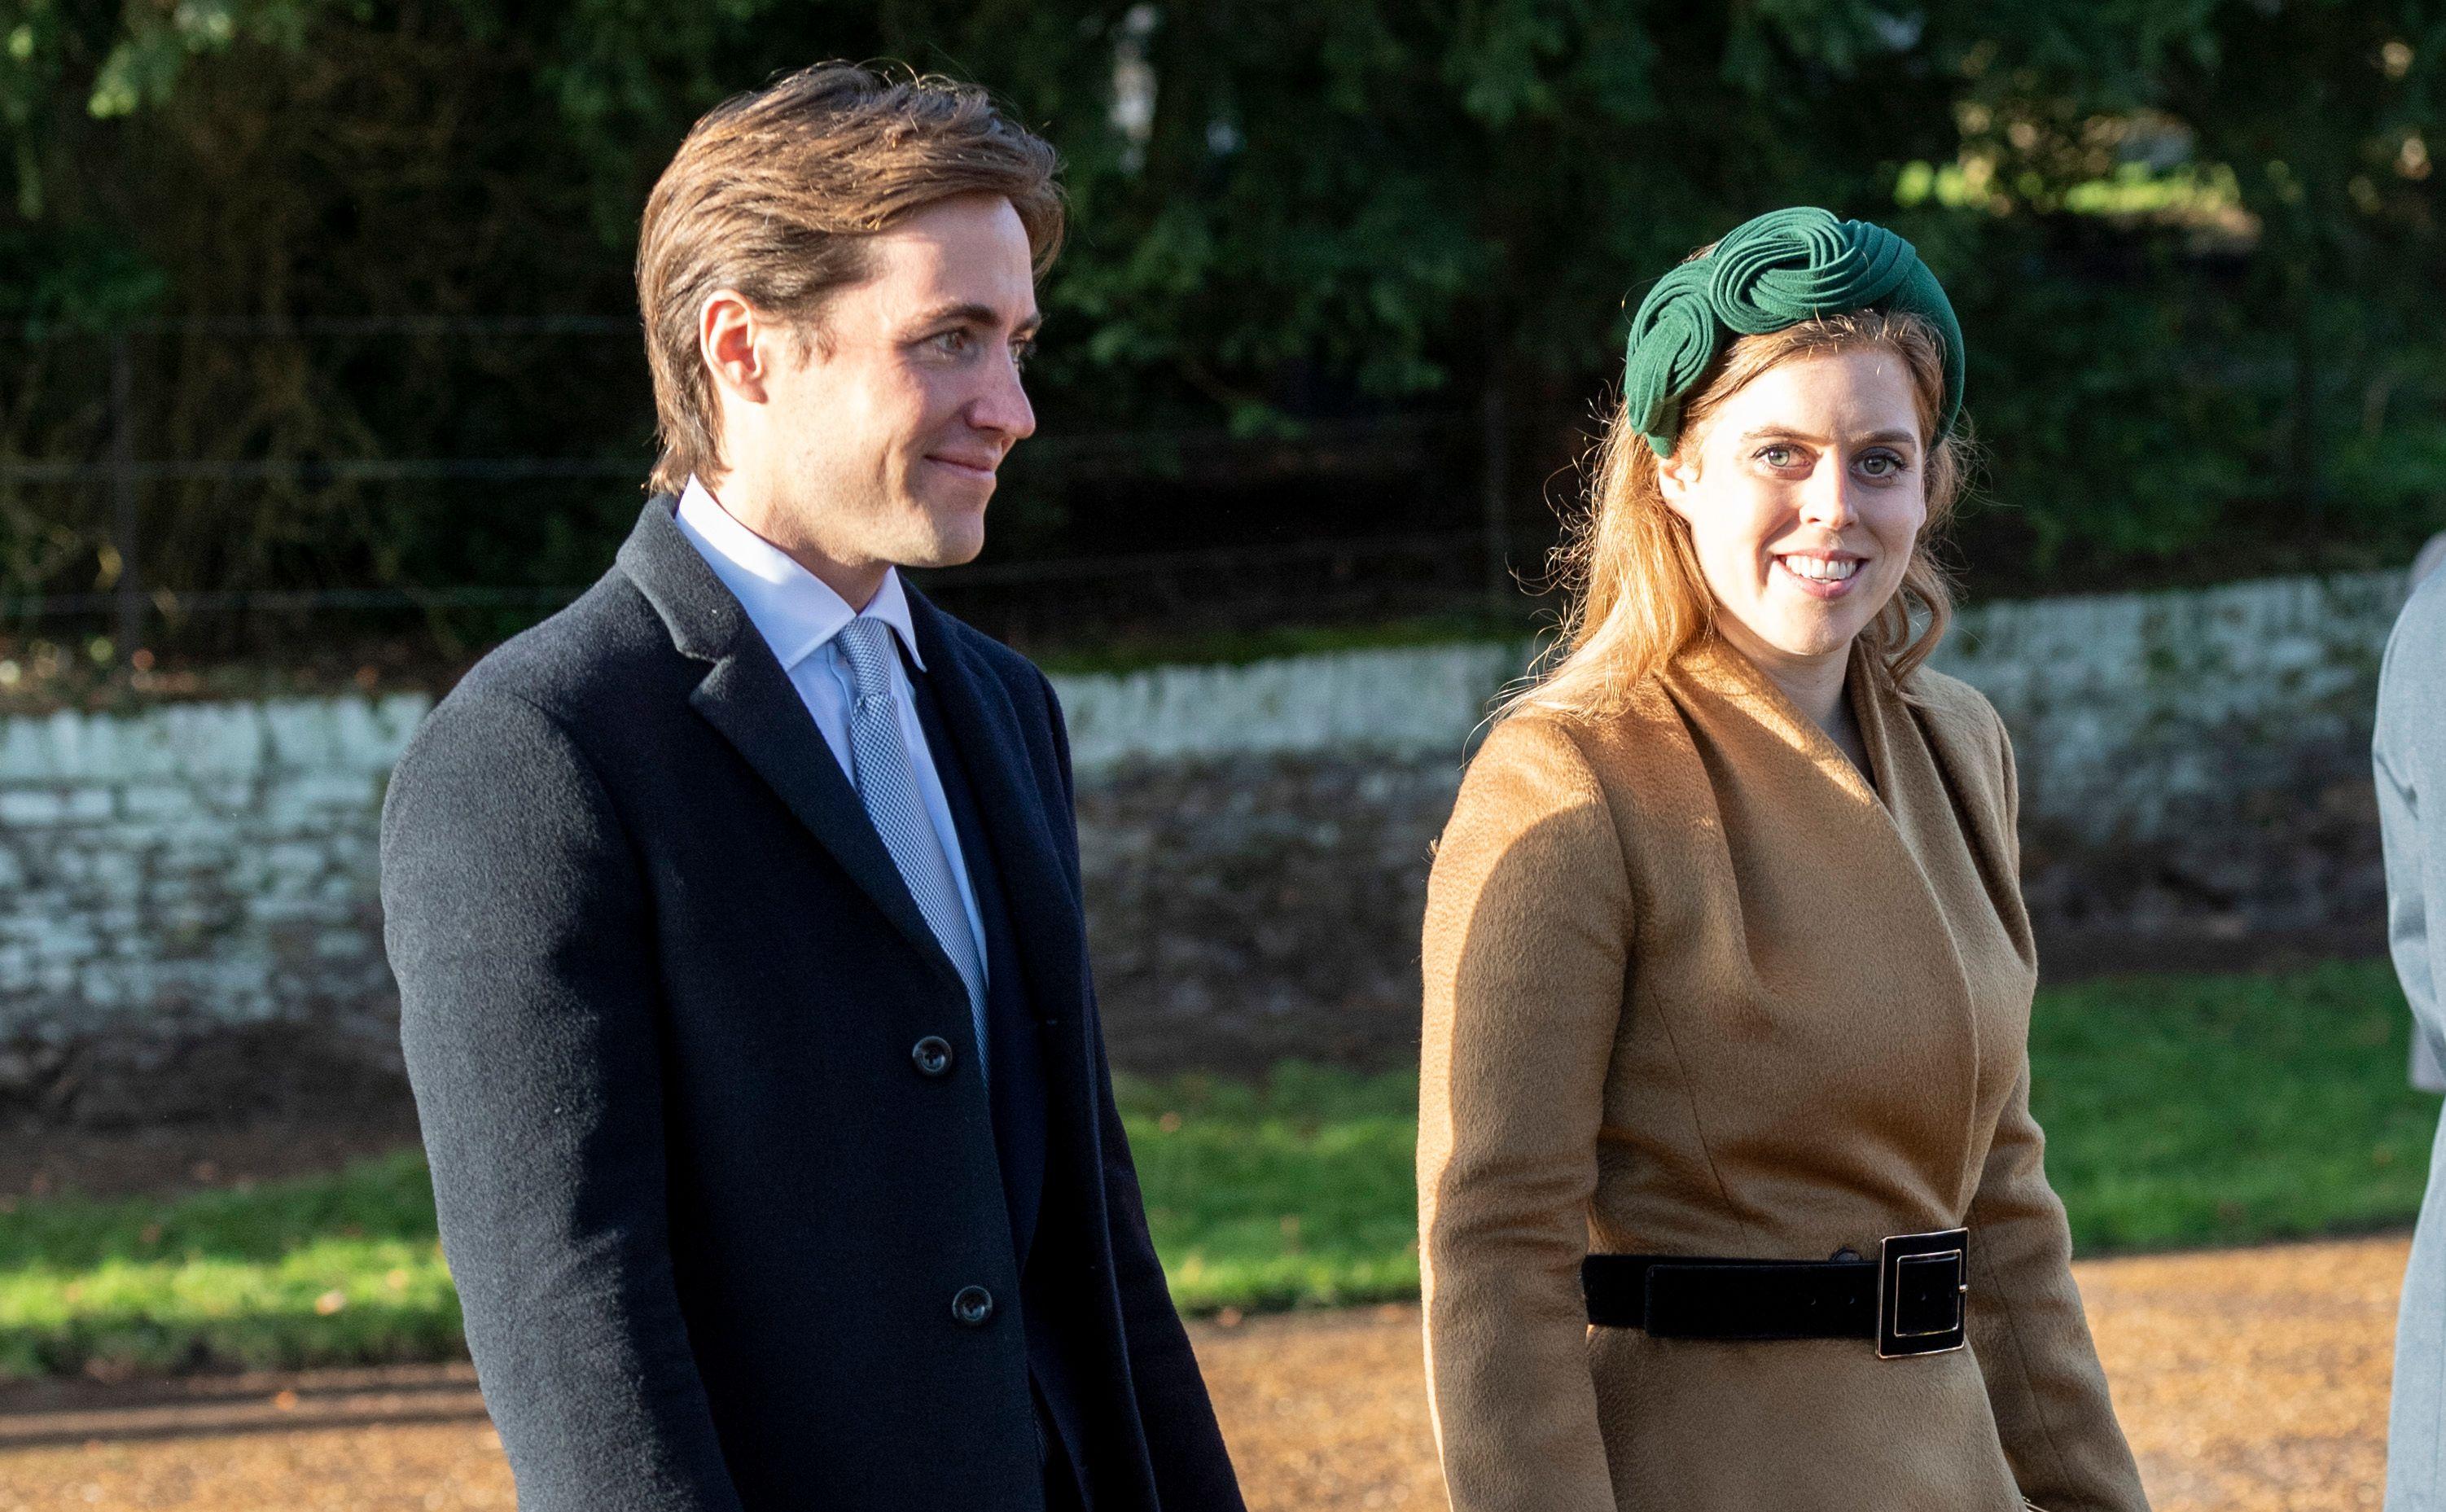 Princess Beatrice with her fiance Eduardo on Christmas day at Sandringham